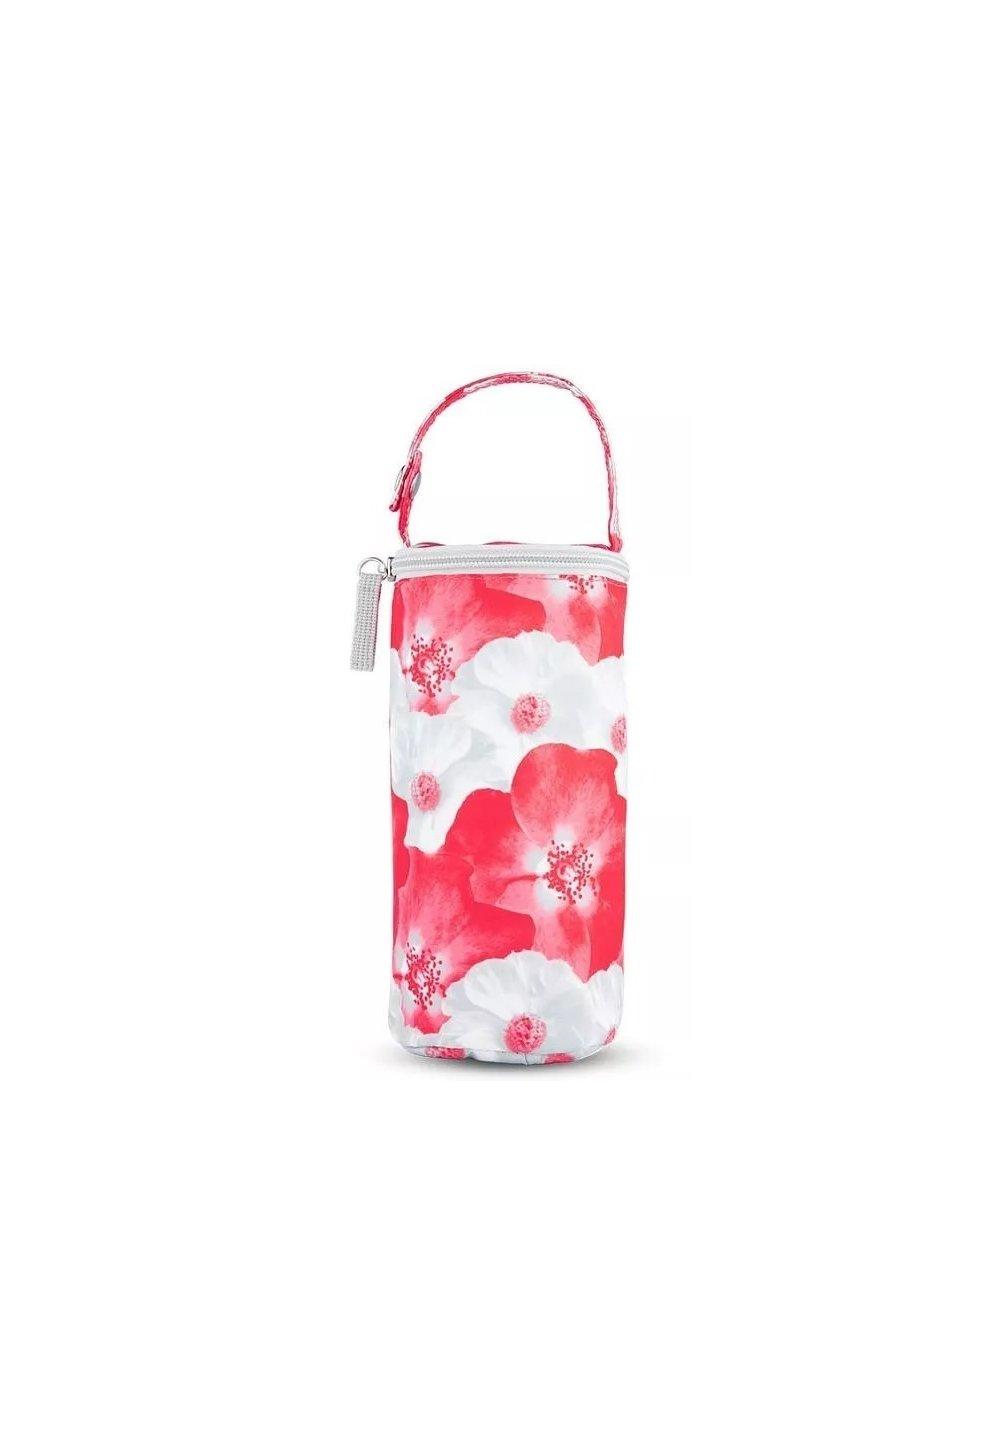 Izolator pentru biberoane, Lady mum, rosu cu flori imagine